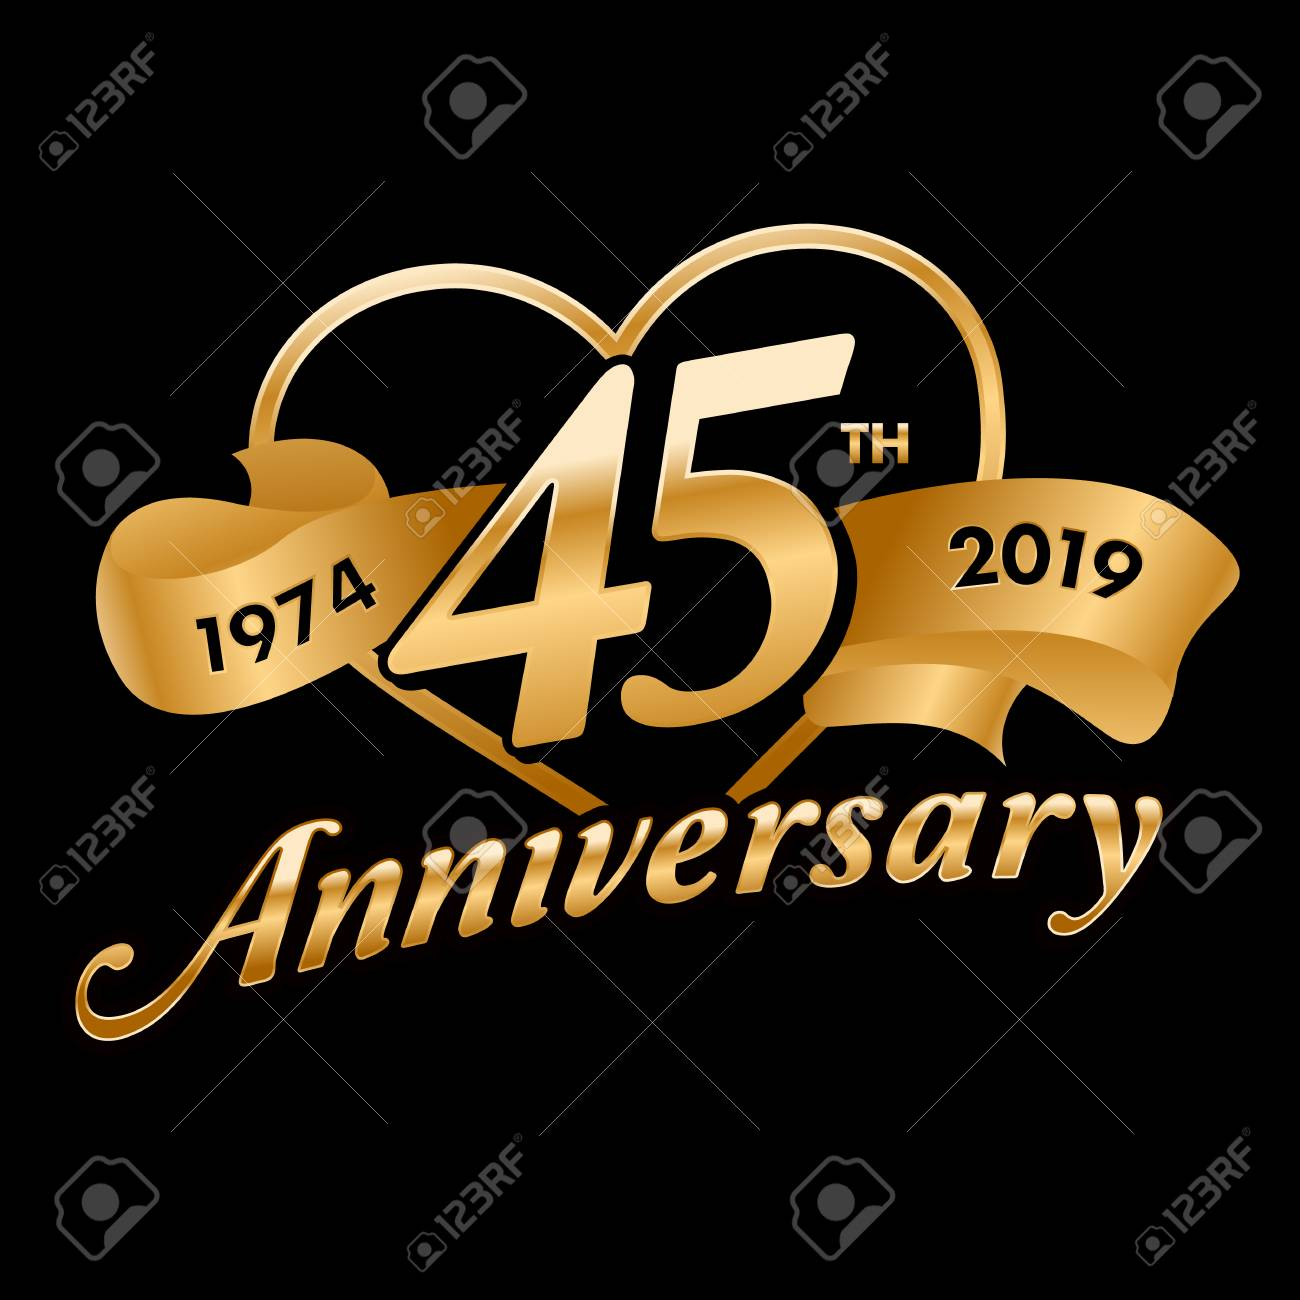 45th Anniversary - 121759301